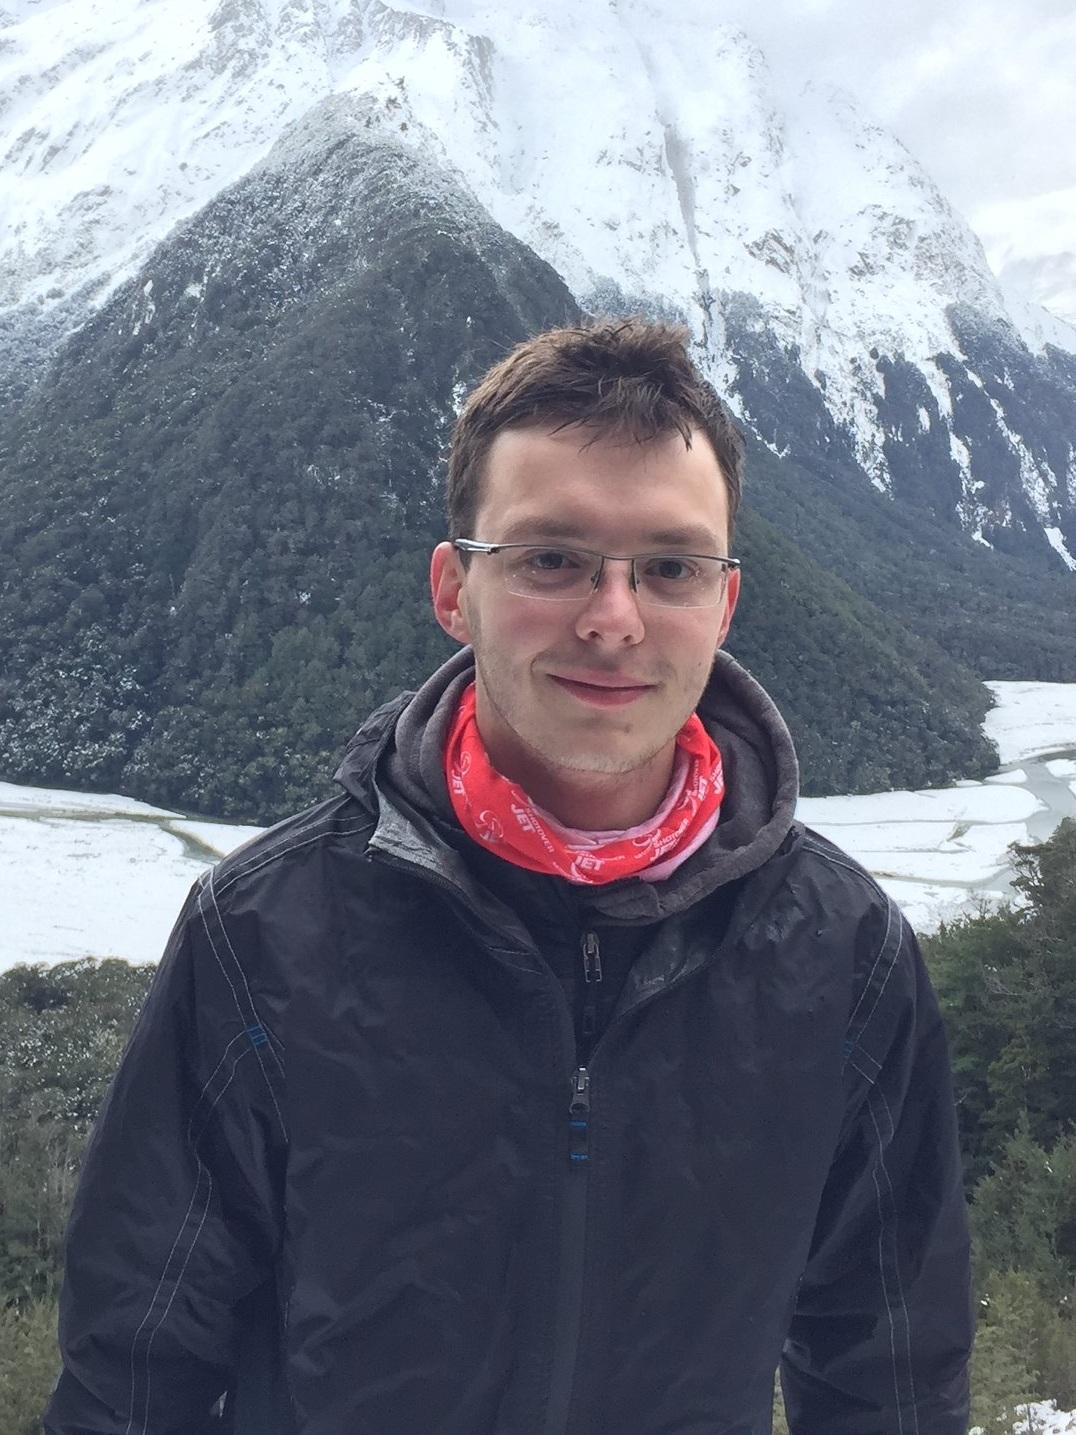 Alexander Ball - PhD studentagb2kp [at] virginia.edu